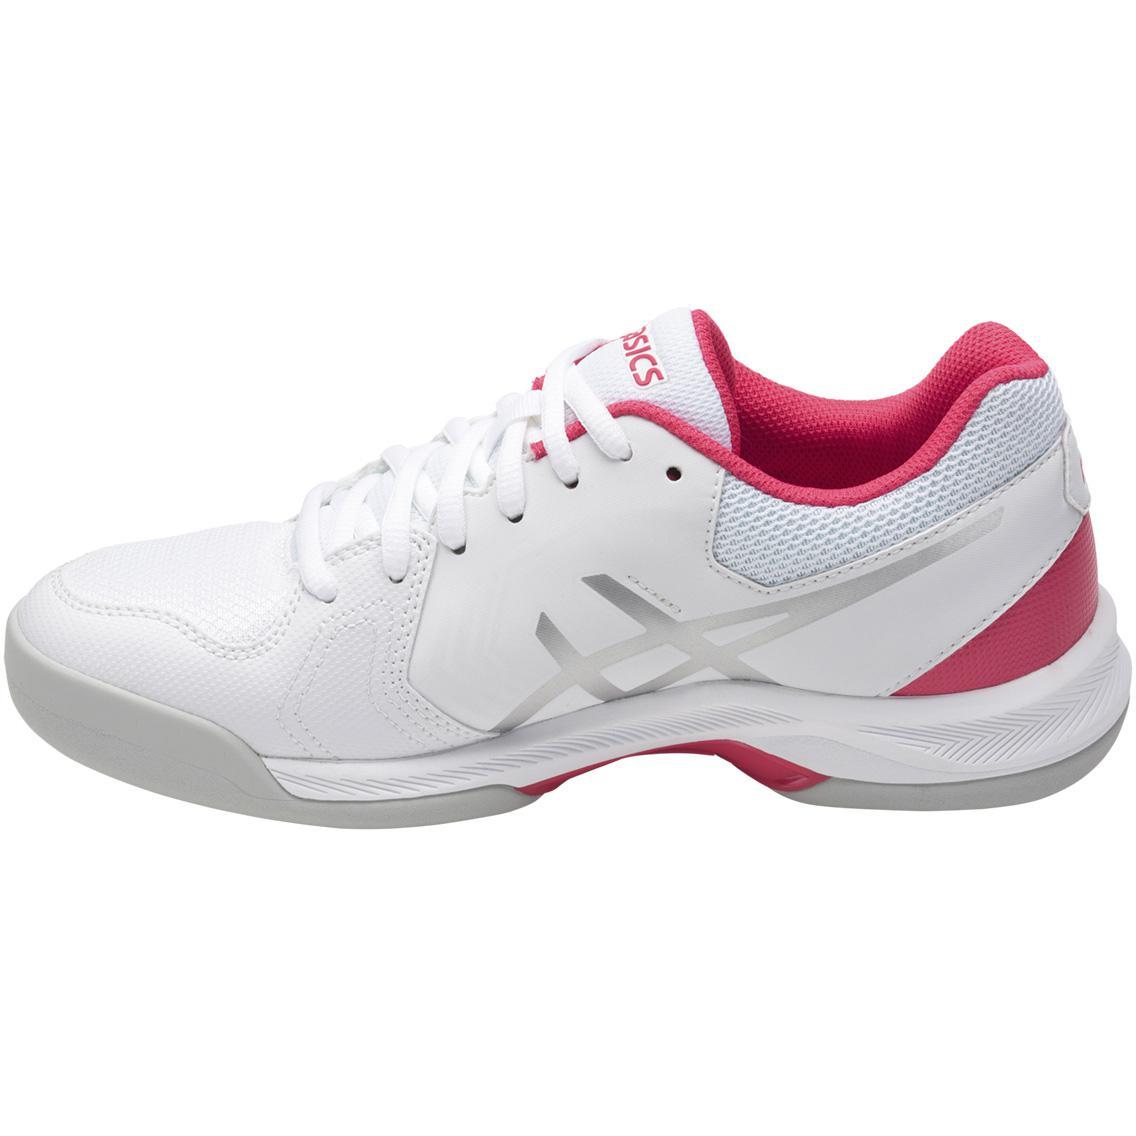 Asics Womens Dedicate  Tennis Shoes